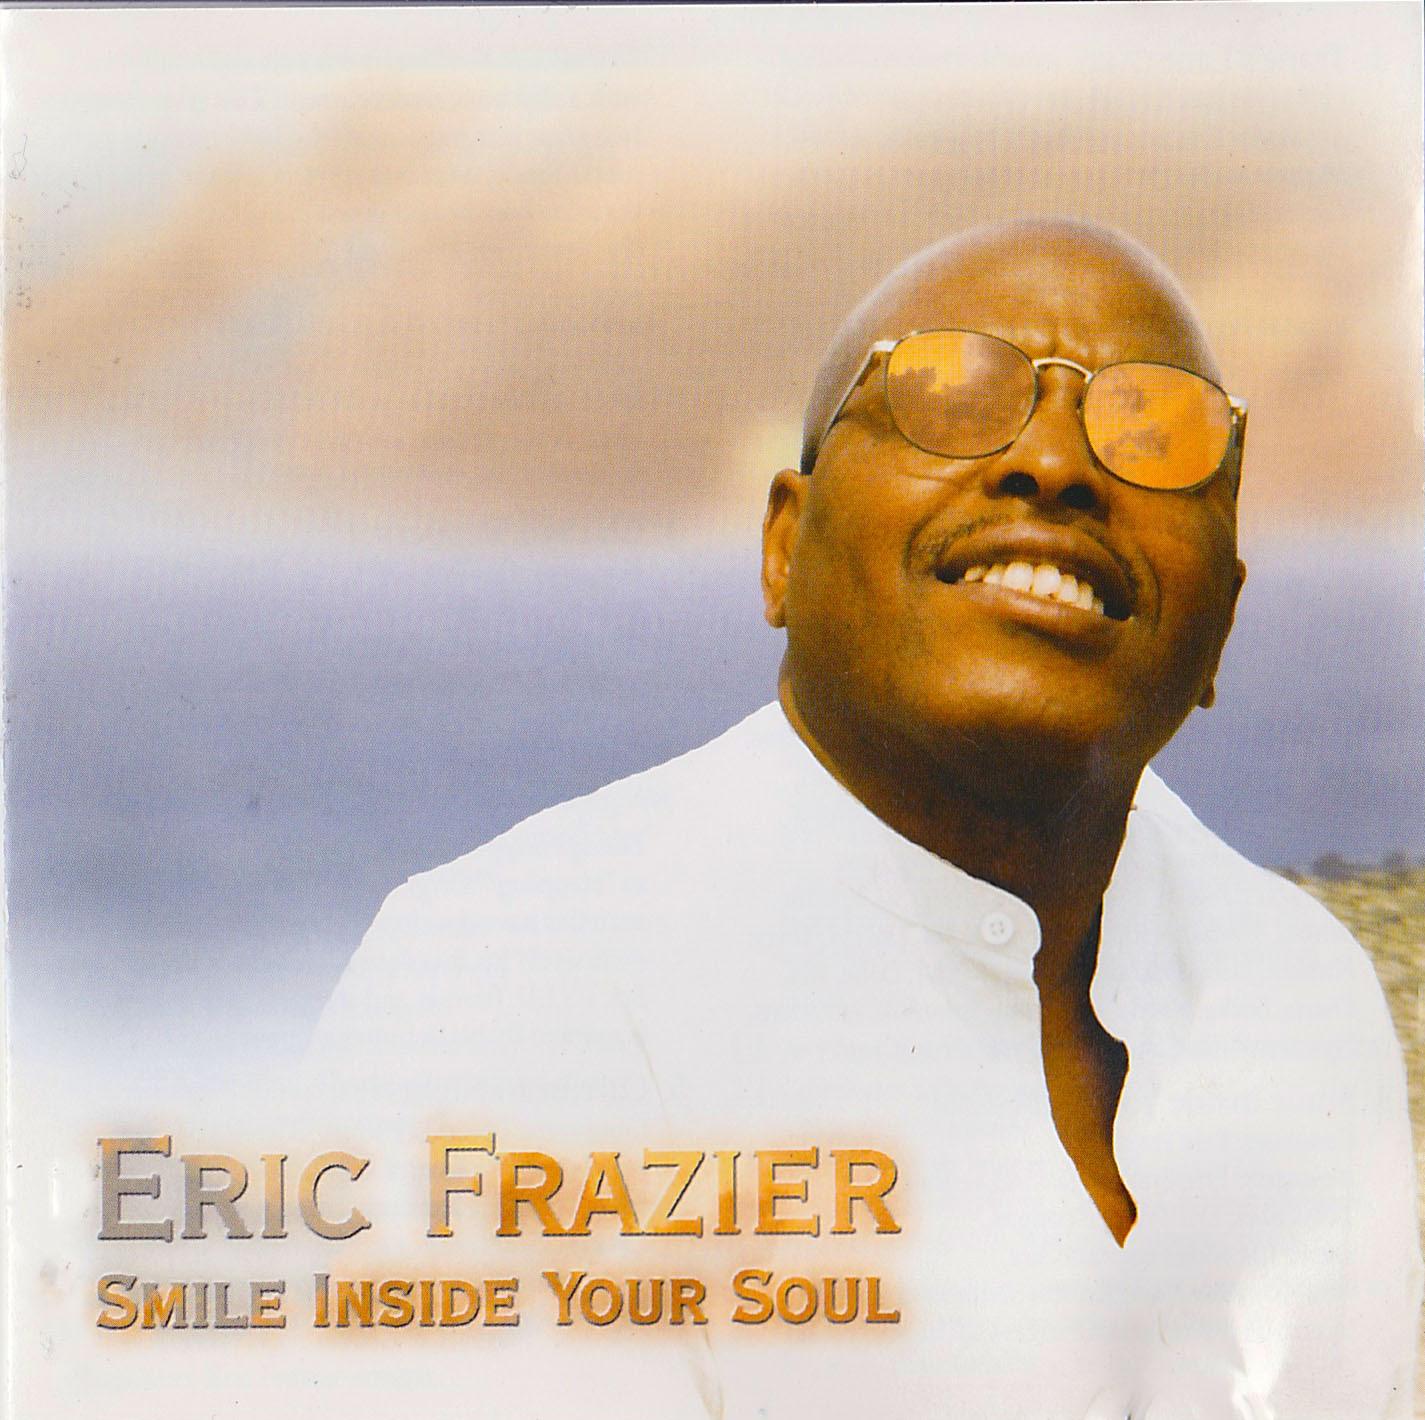 EricFrazieralbum copy